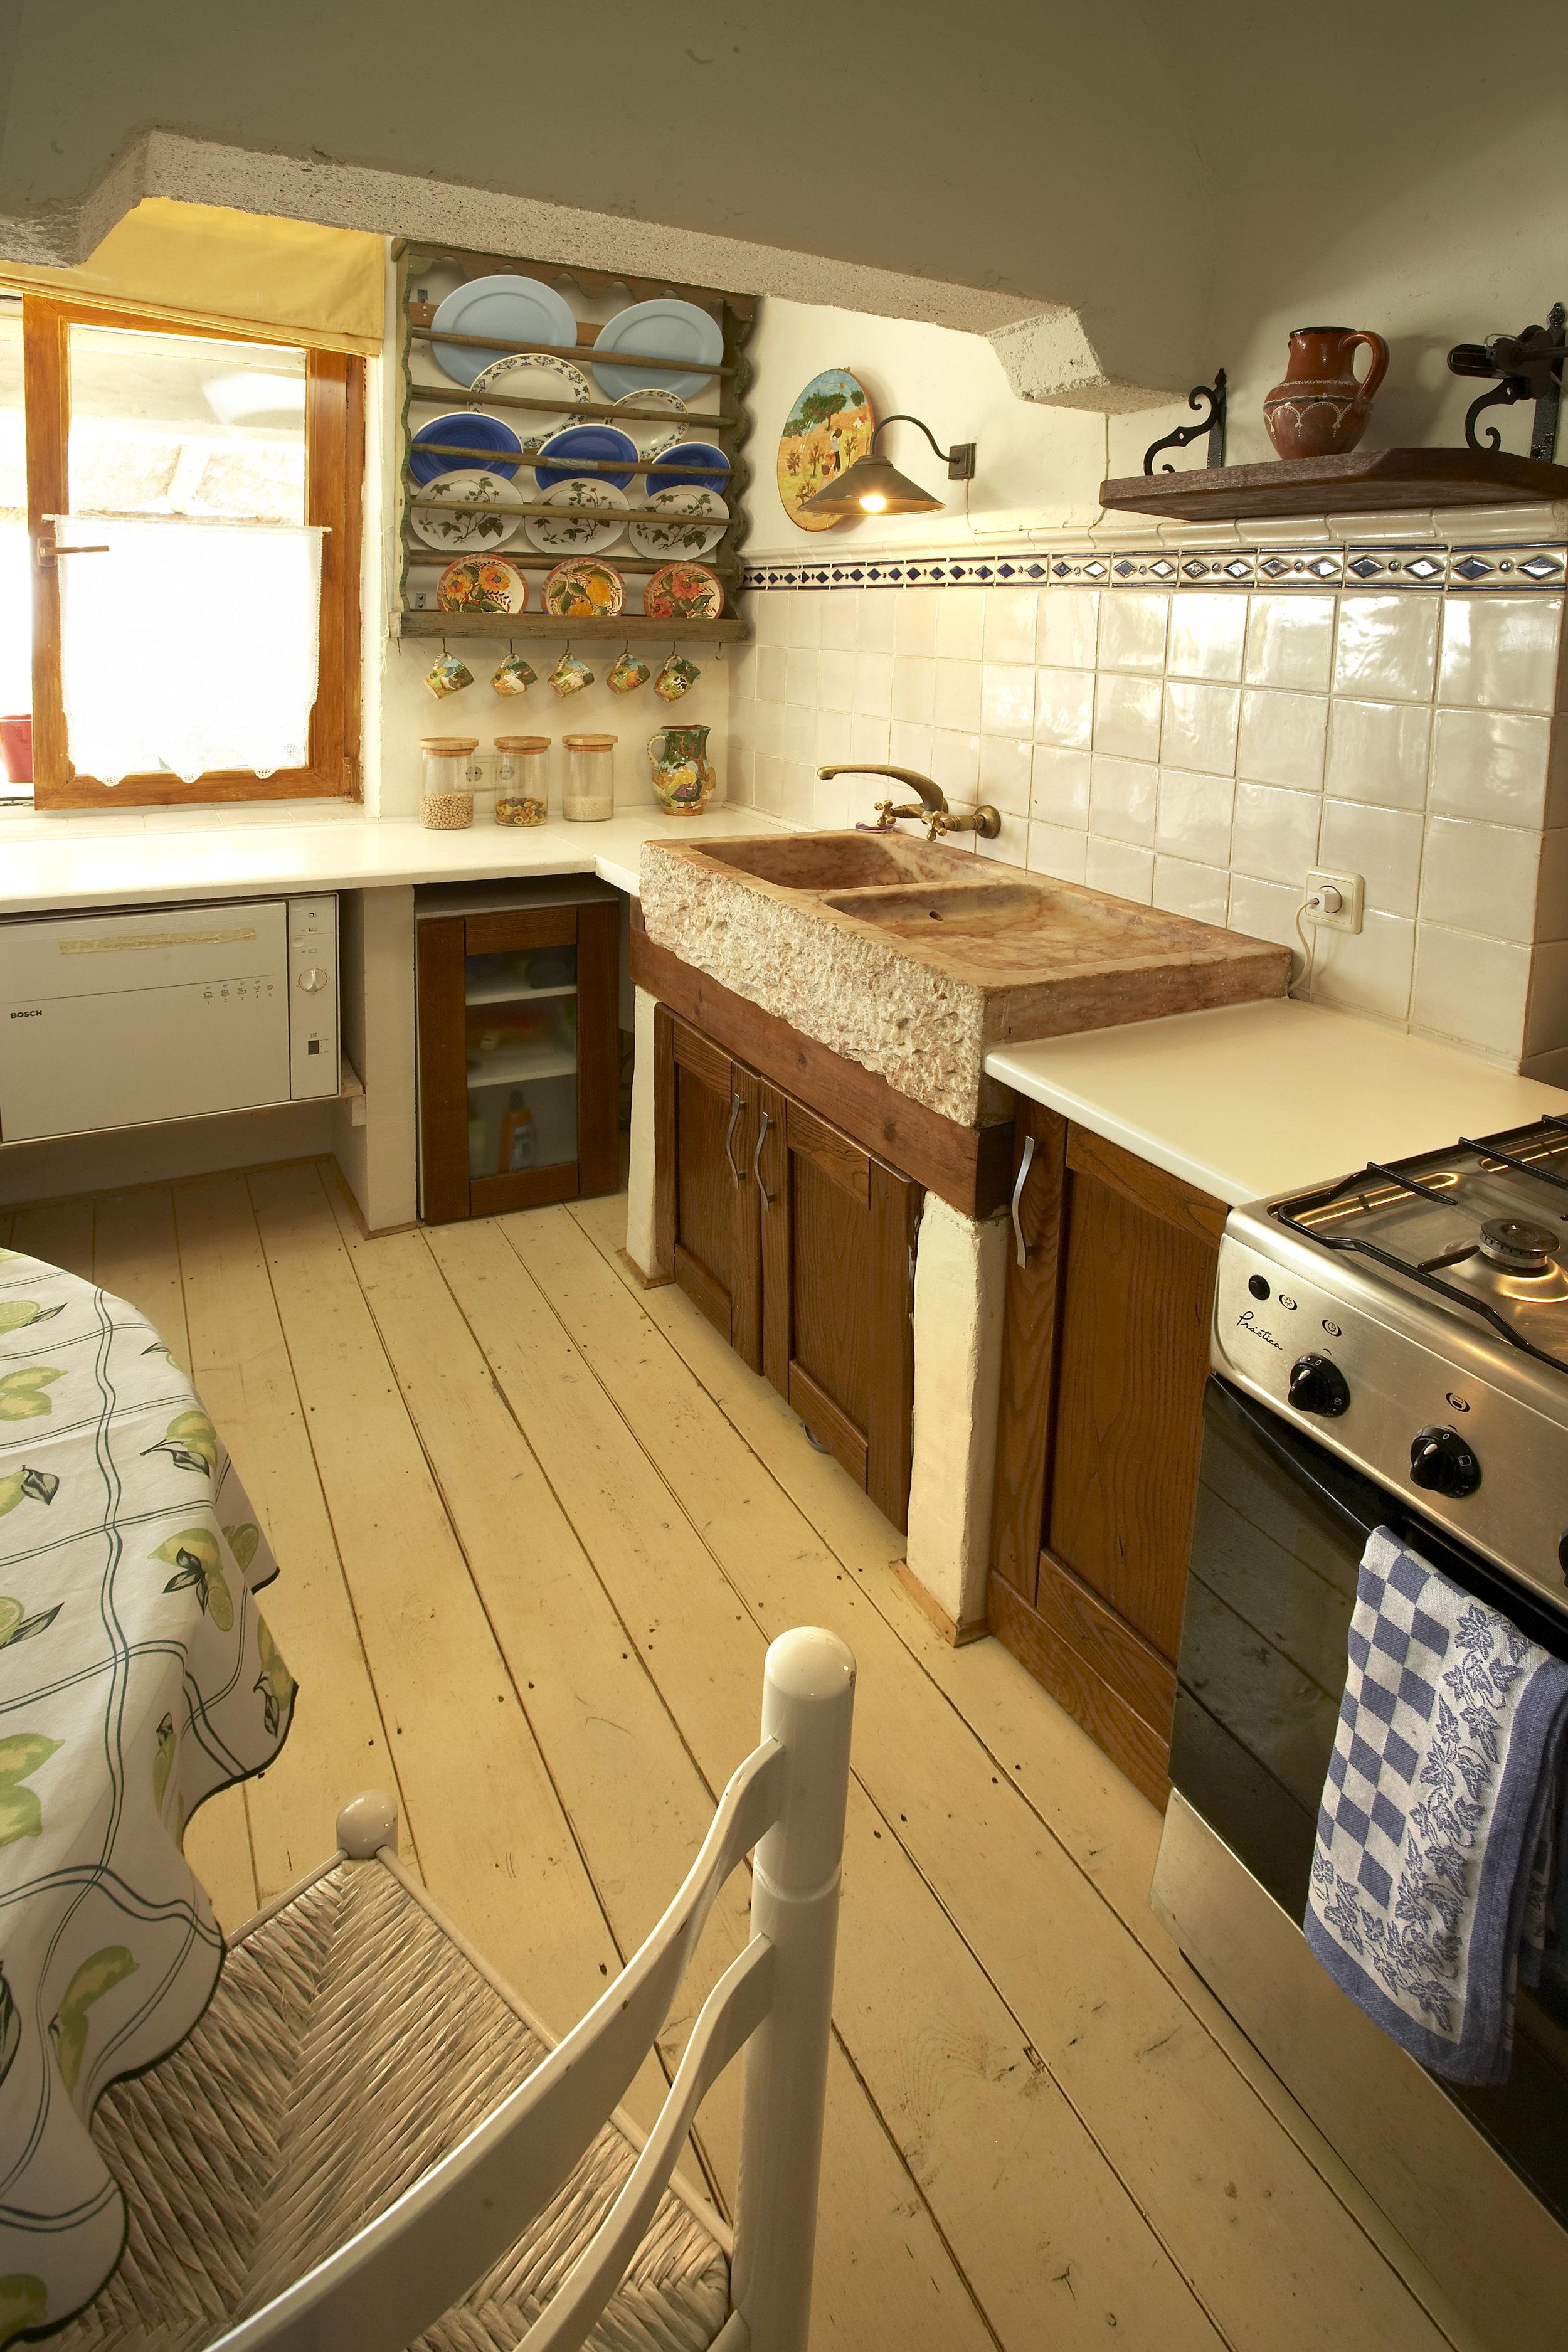 08_Main House Kitchen1.jpg